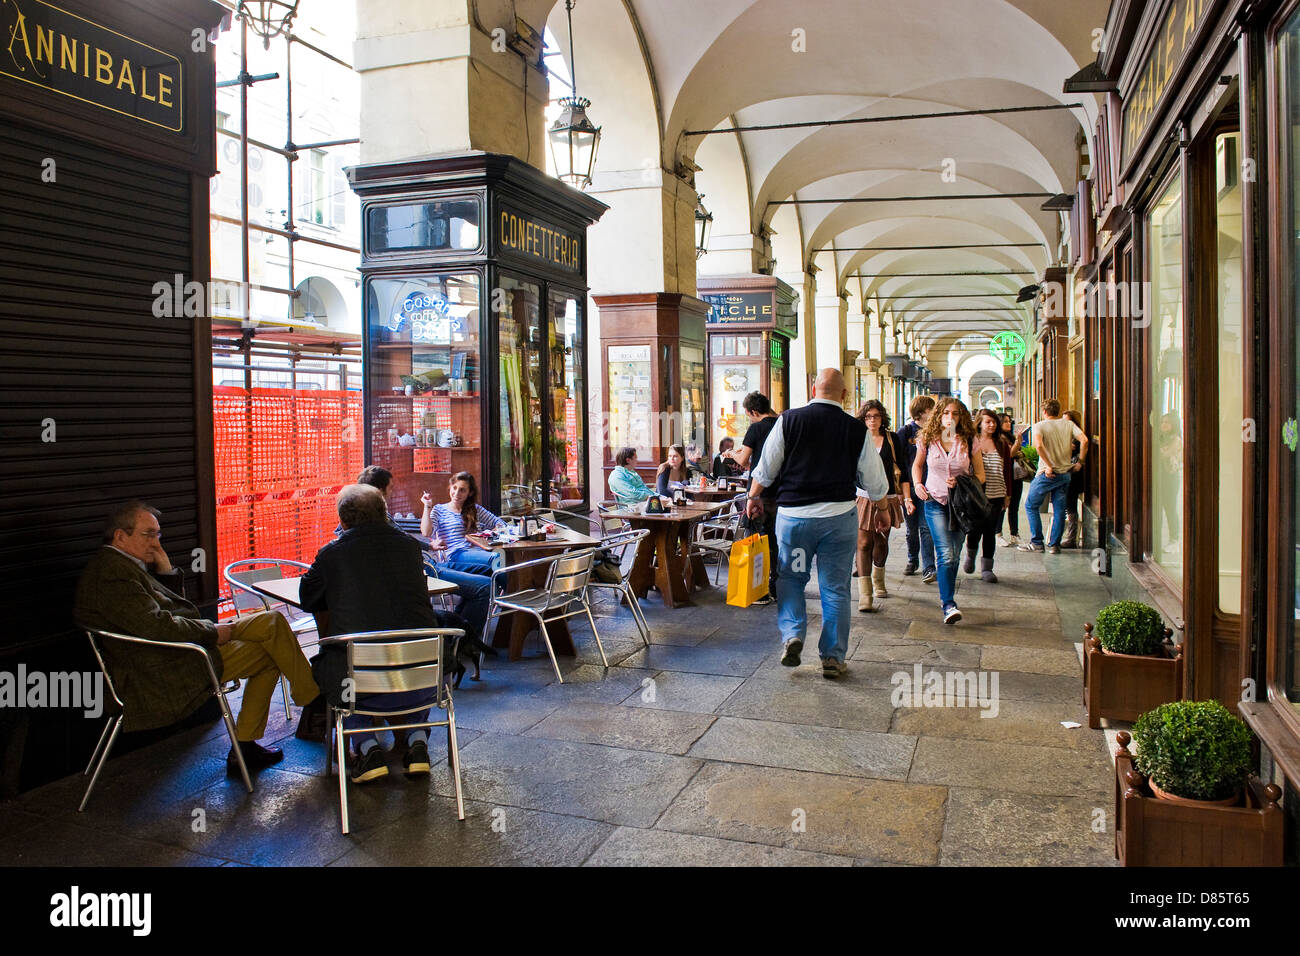 Italy Piedmont Turin daily life - Stock Image